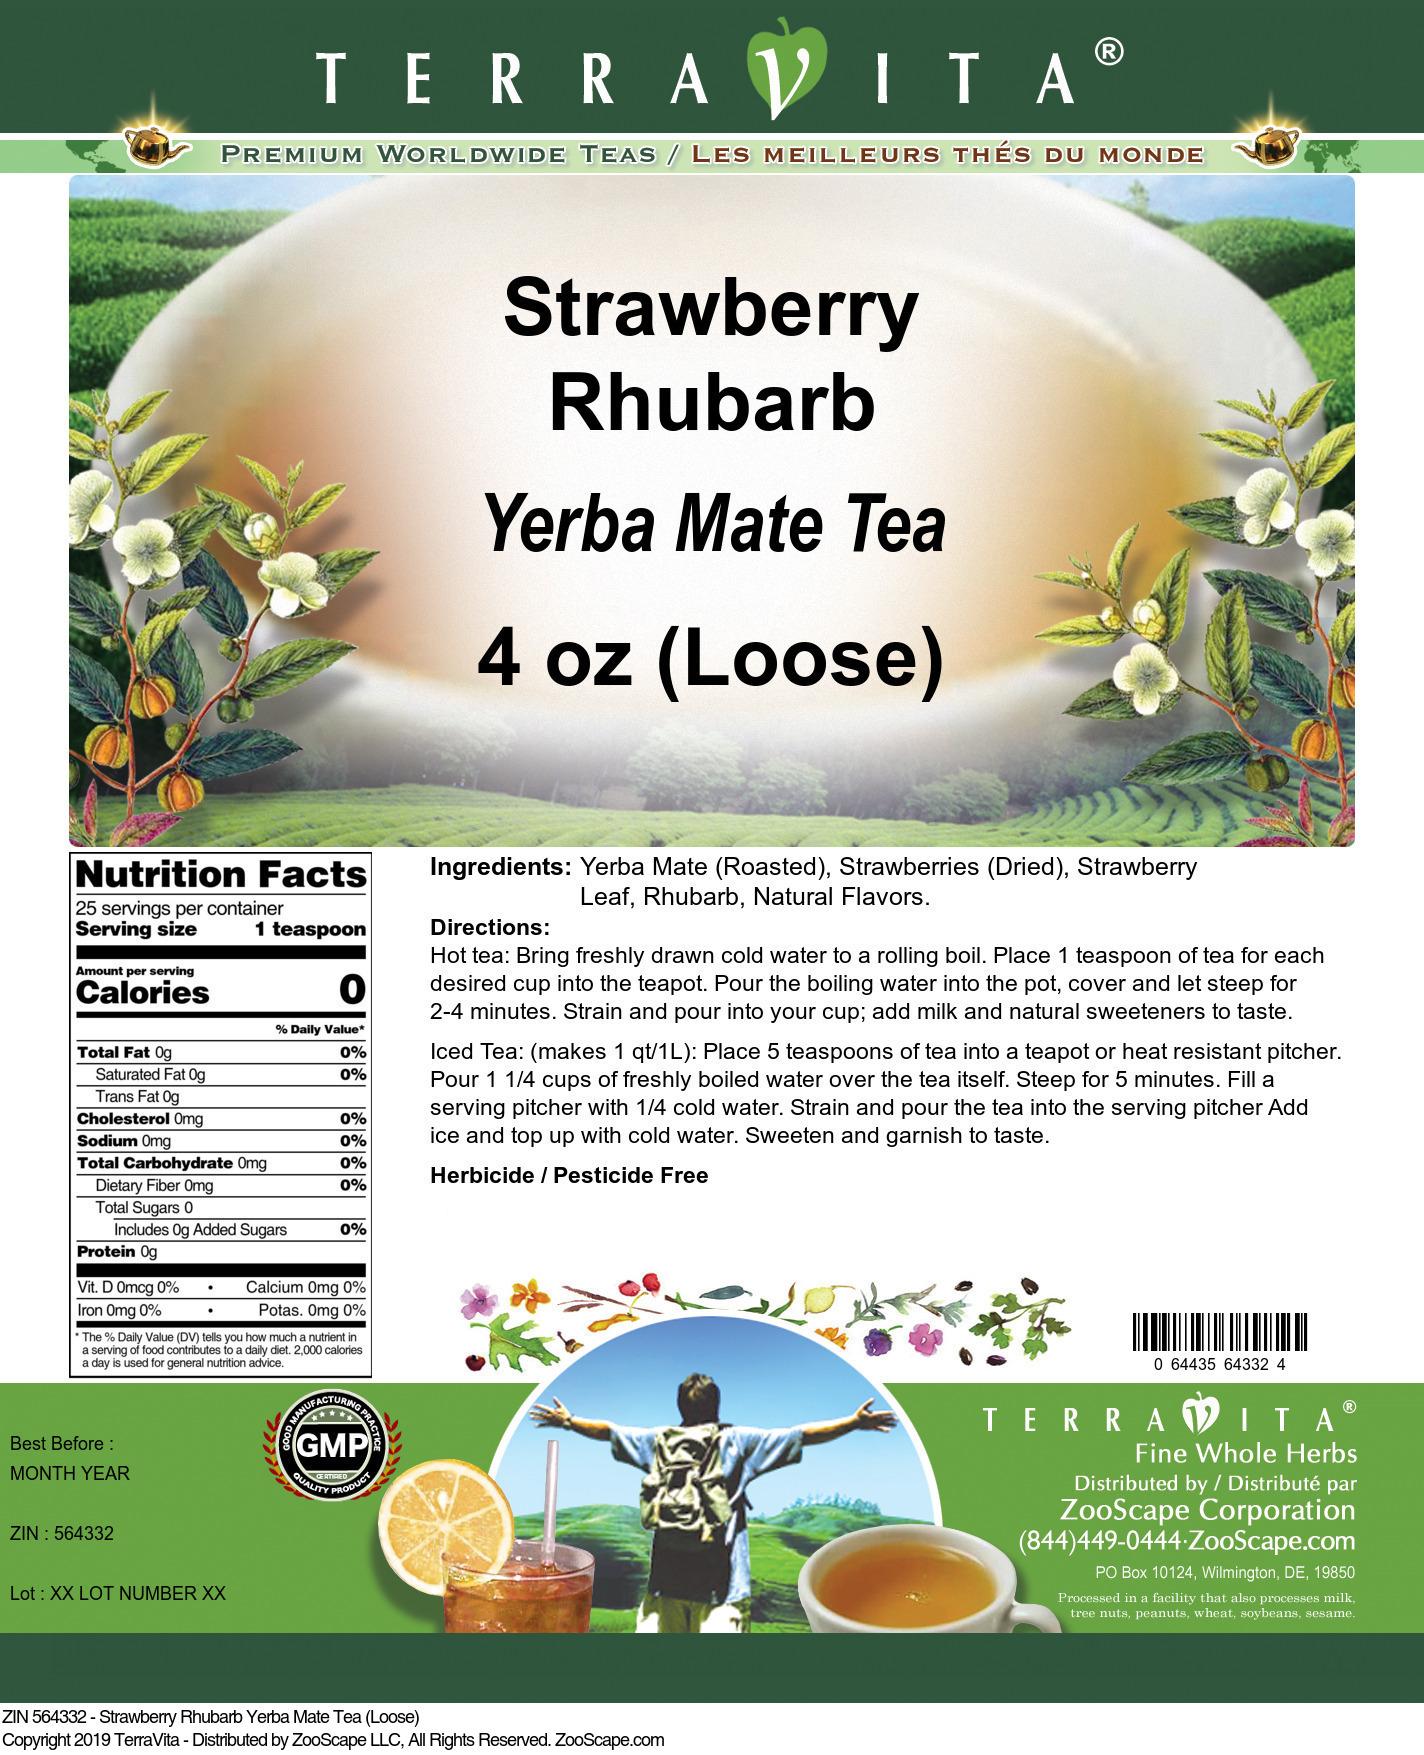 Strawberry Rhubarb Yerba Mate Tea (Loose)